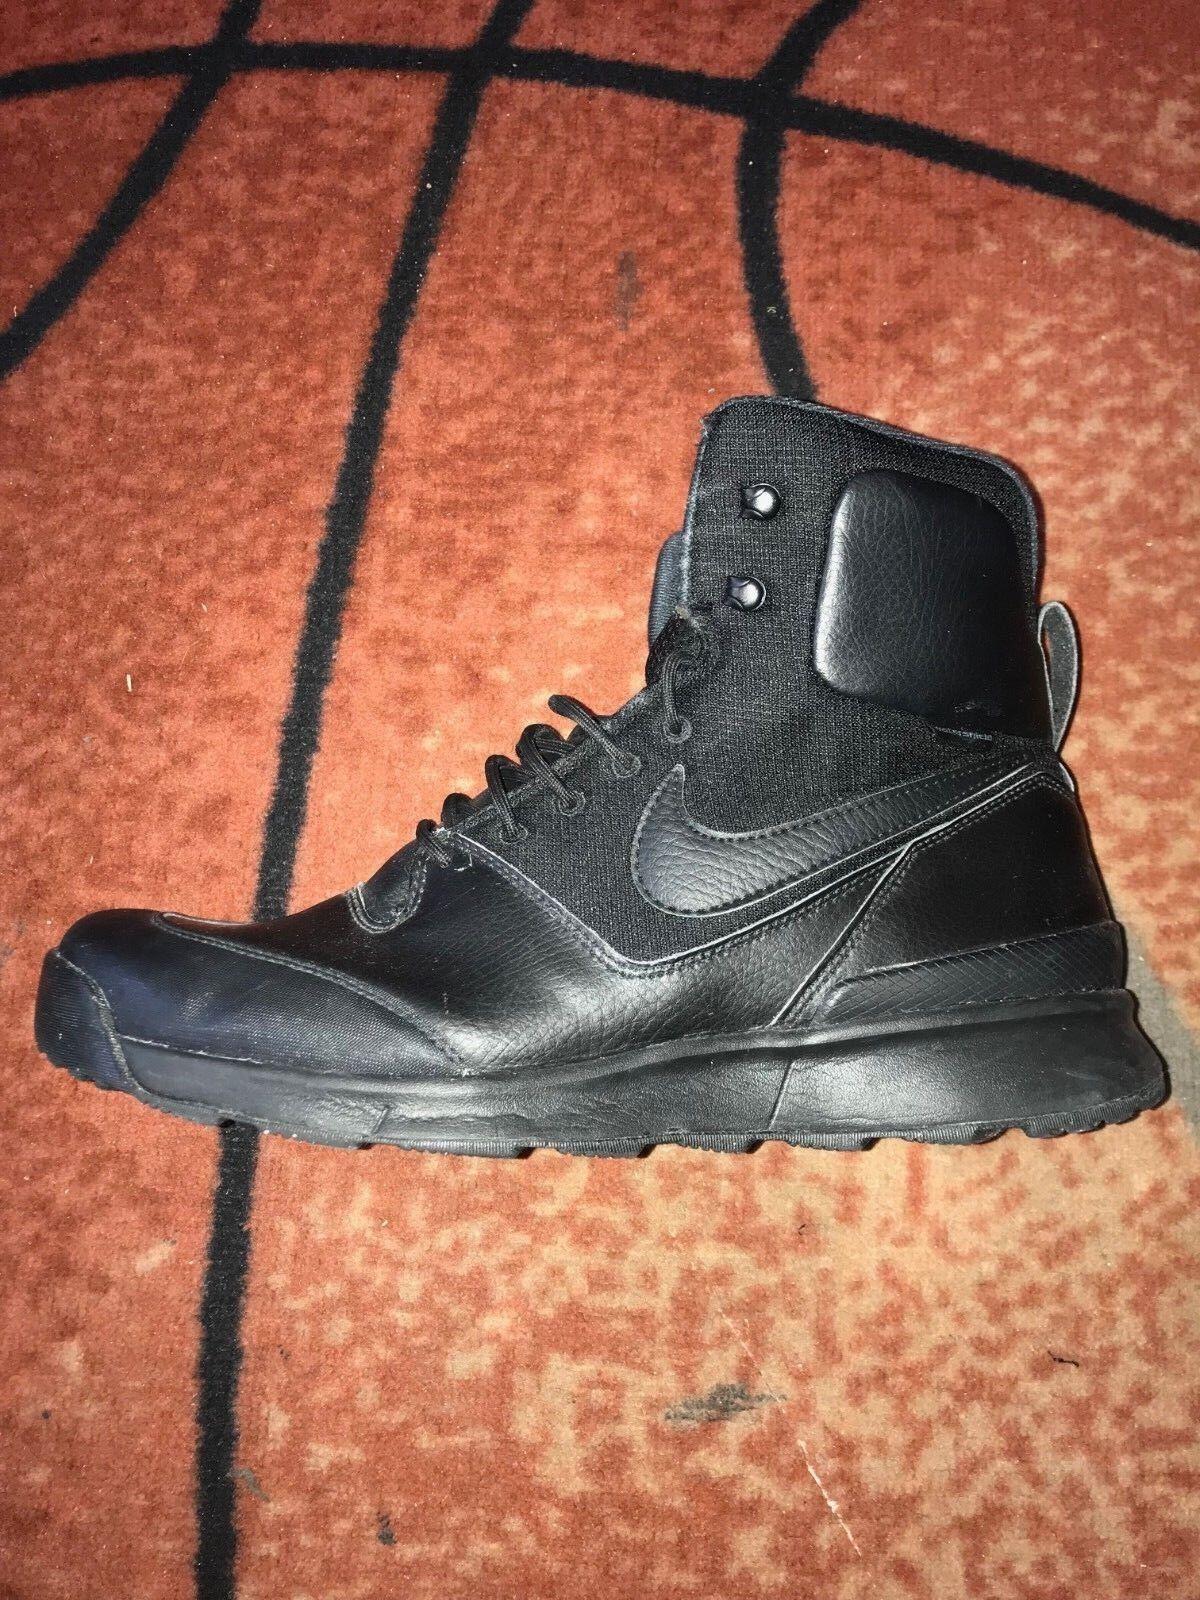 Nike ACG Stasis Pre-Owned Size 11 Black